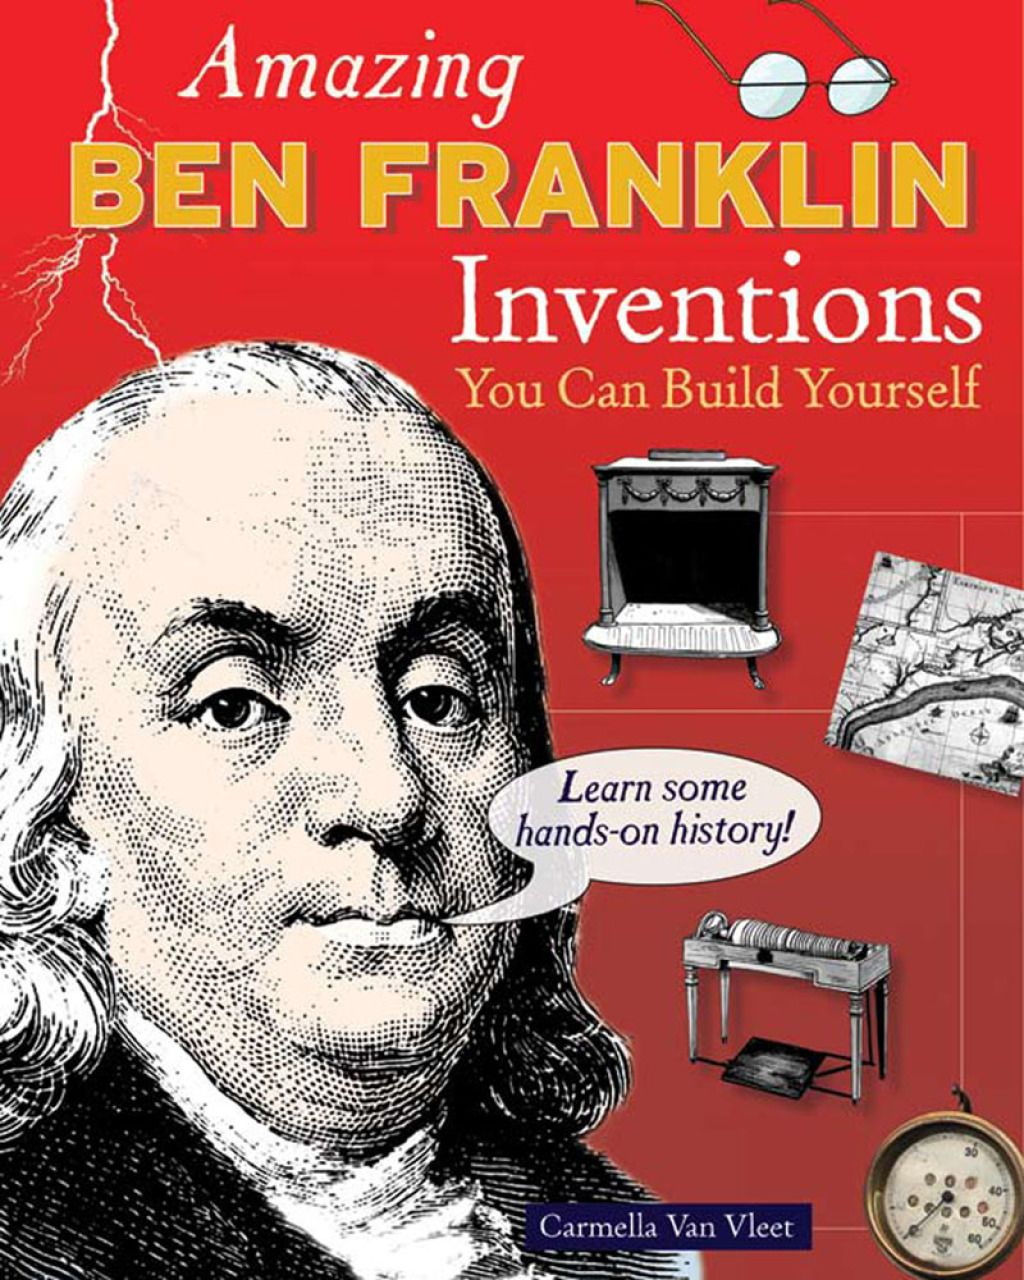 Amazing Ben Franklin Inventions Ebook